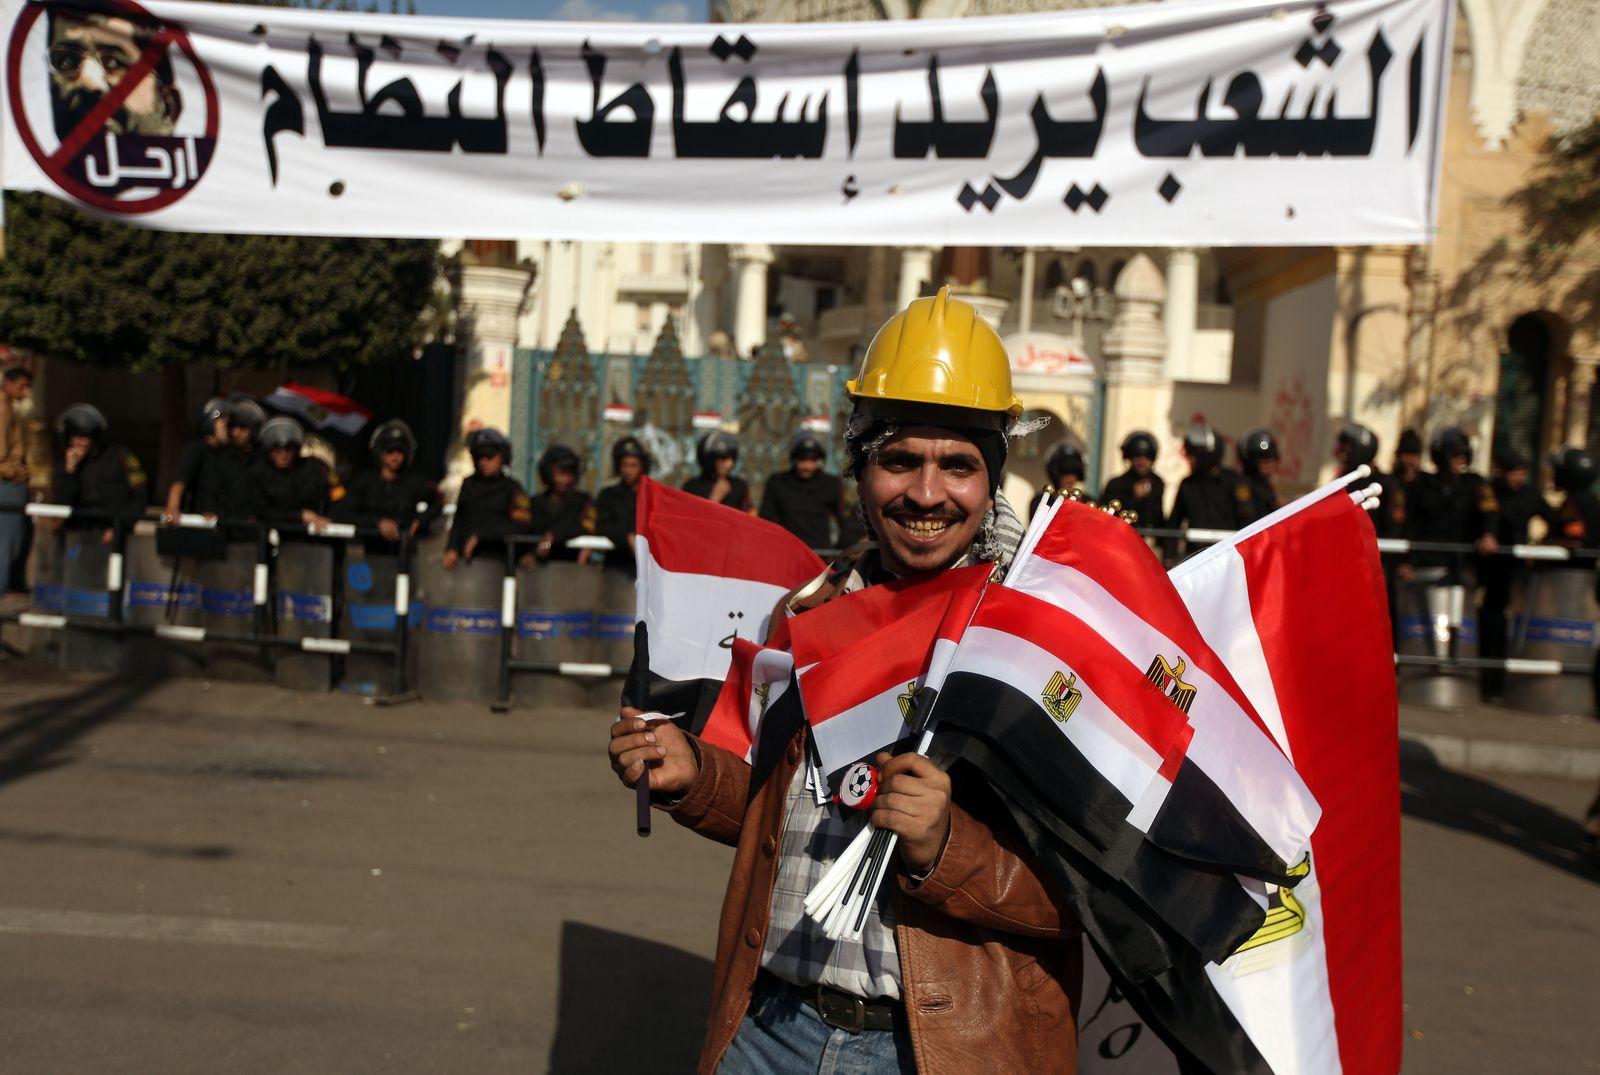 Ägypten/ Protest